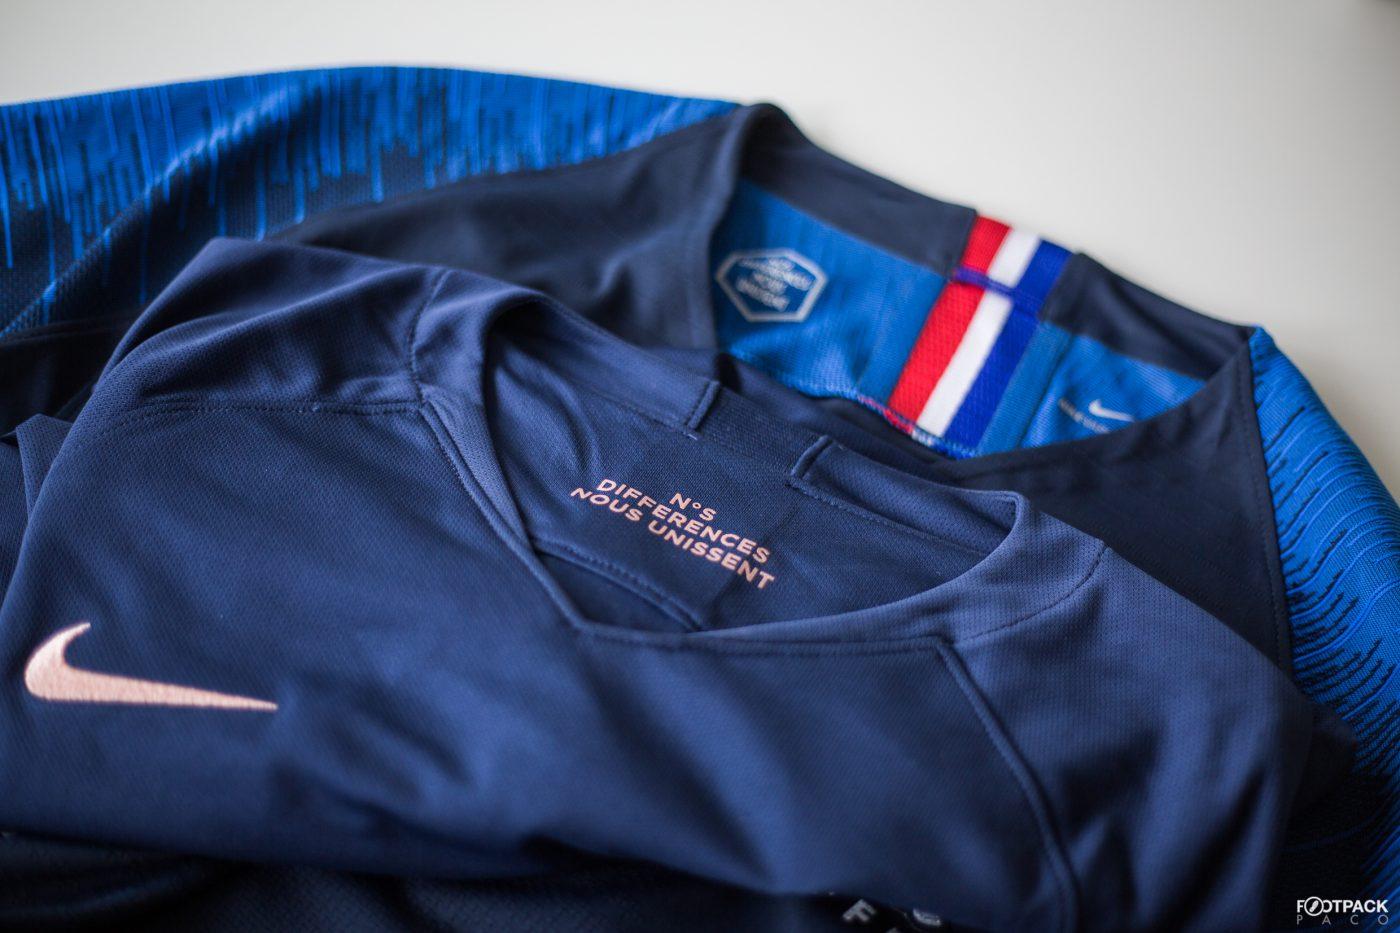 signification-nos-differences-nous-unissent-maillot-france-coupe-du-monde-feminine-nike-10